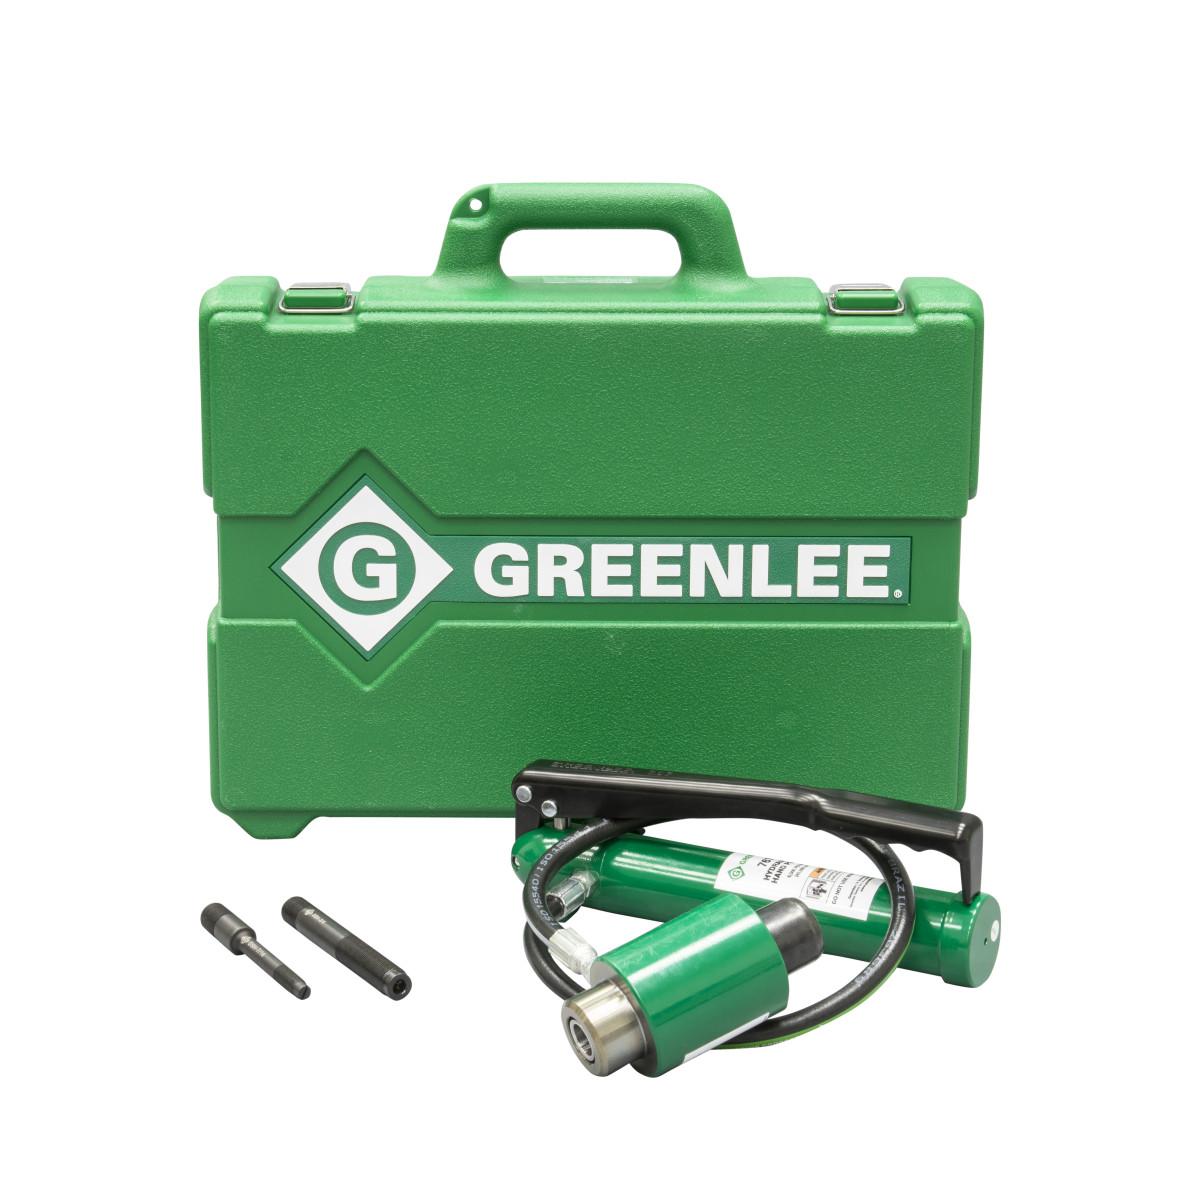 Greenlee 7646 Driver-Punch Hyd (7646)